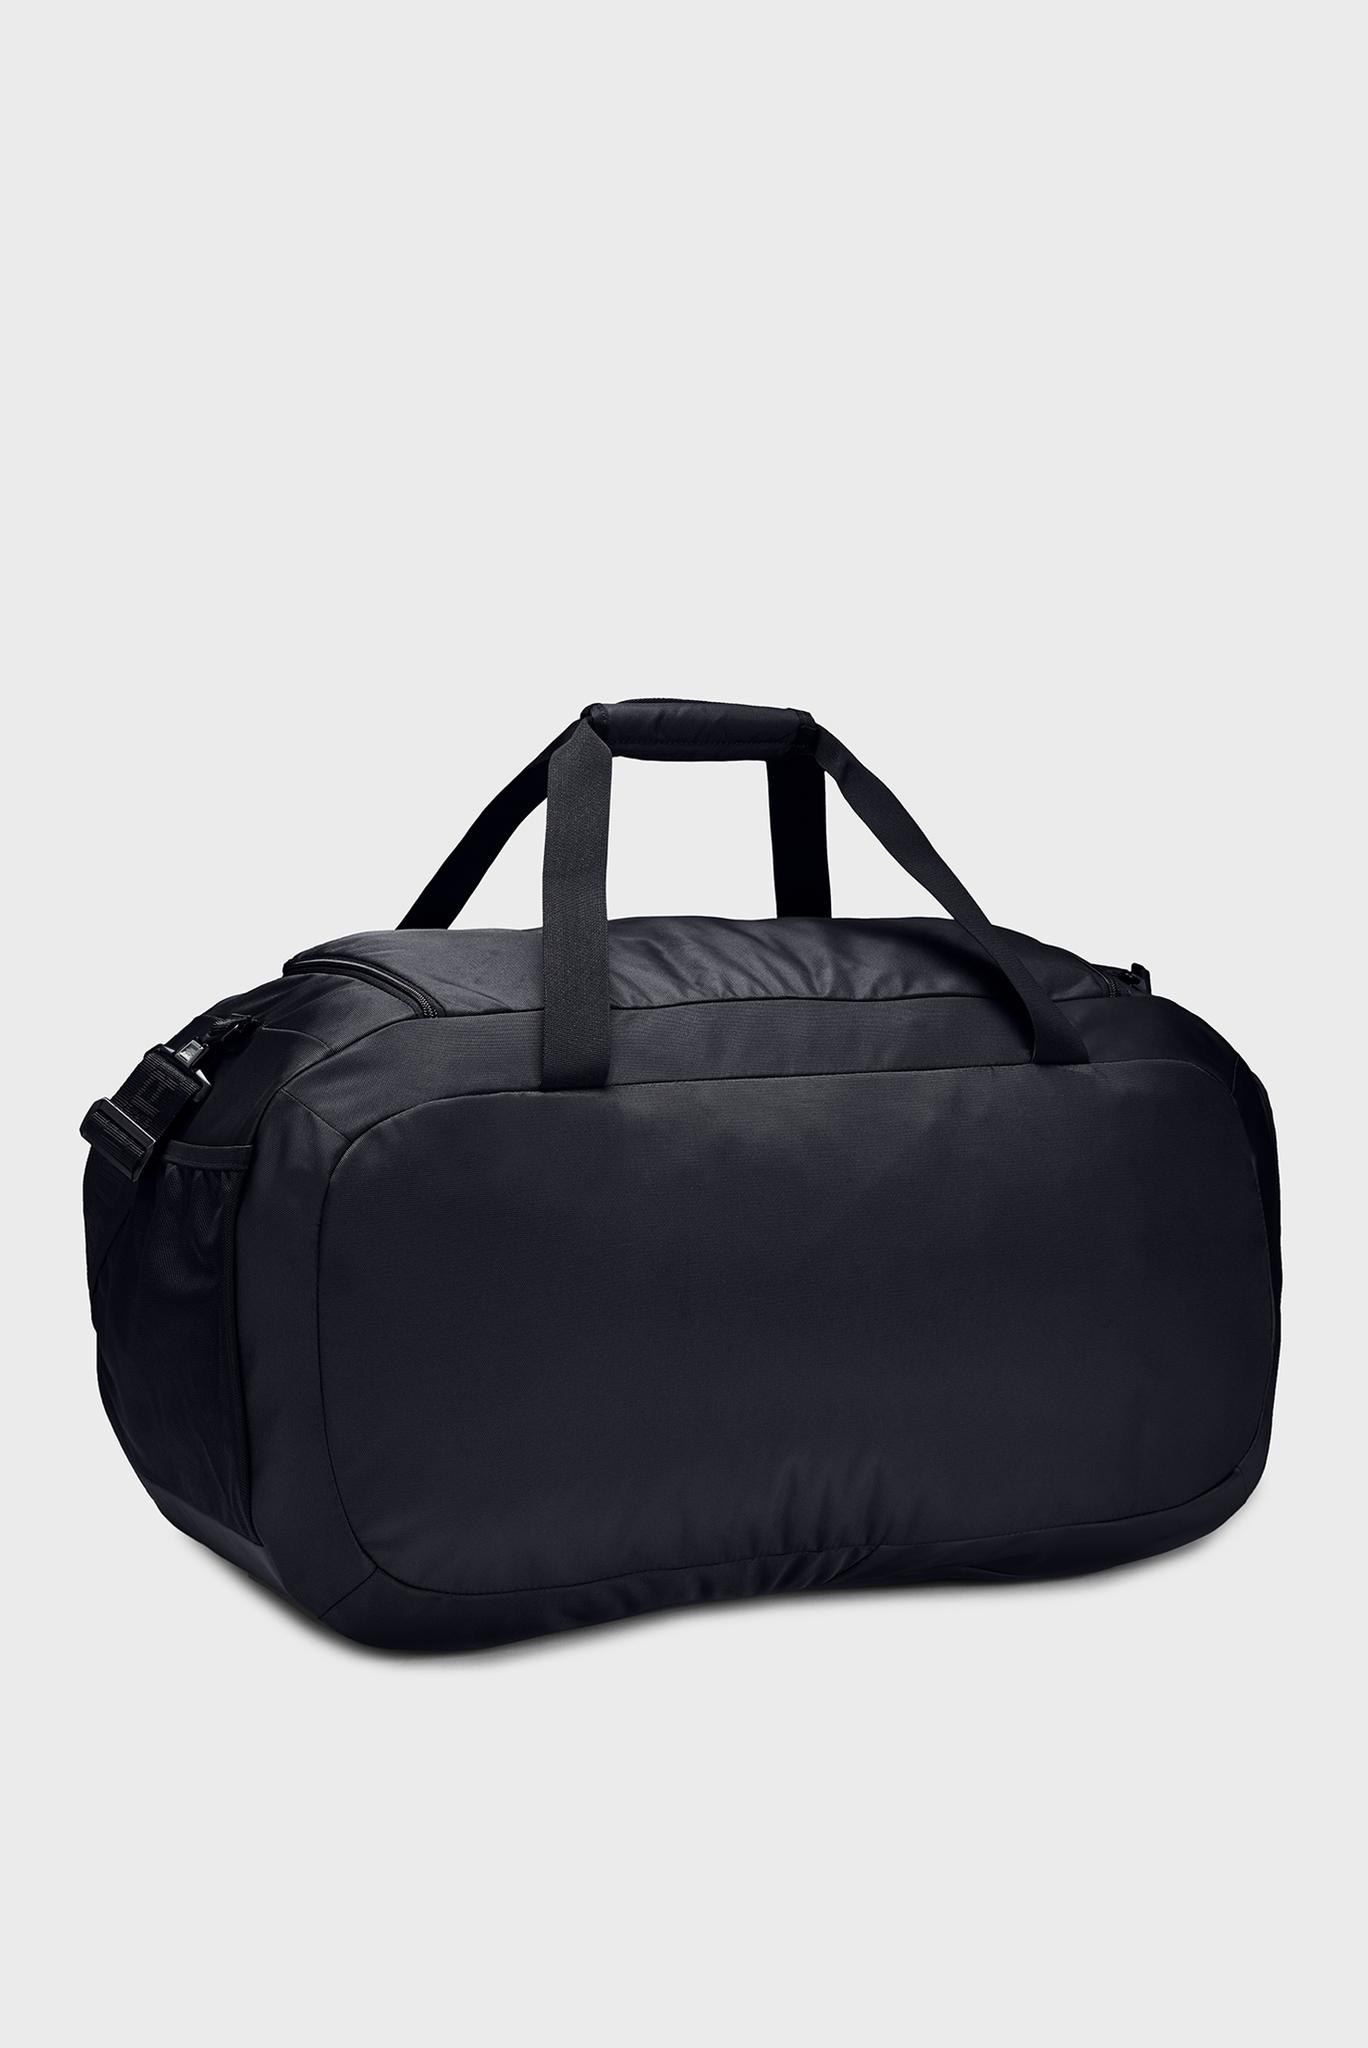 Черная спортивная сумка Undeniable Duffel 4.0 LG Under Armour